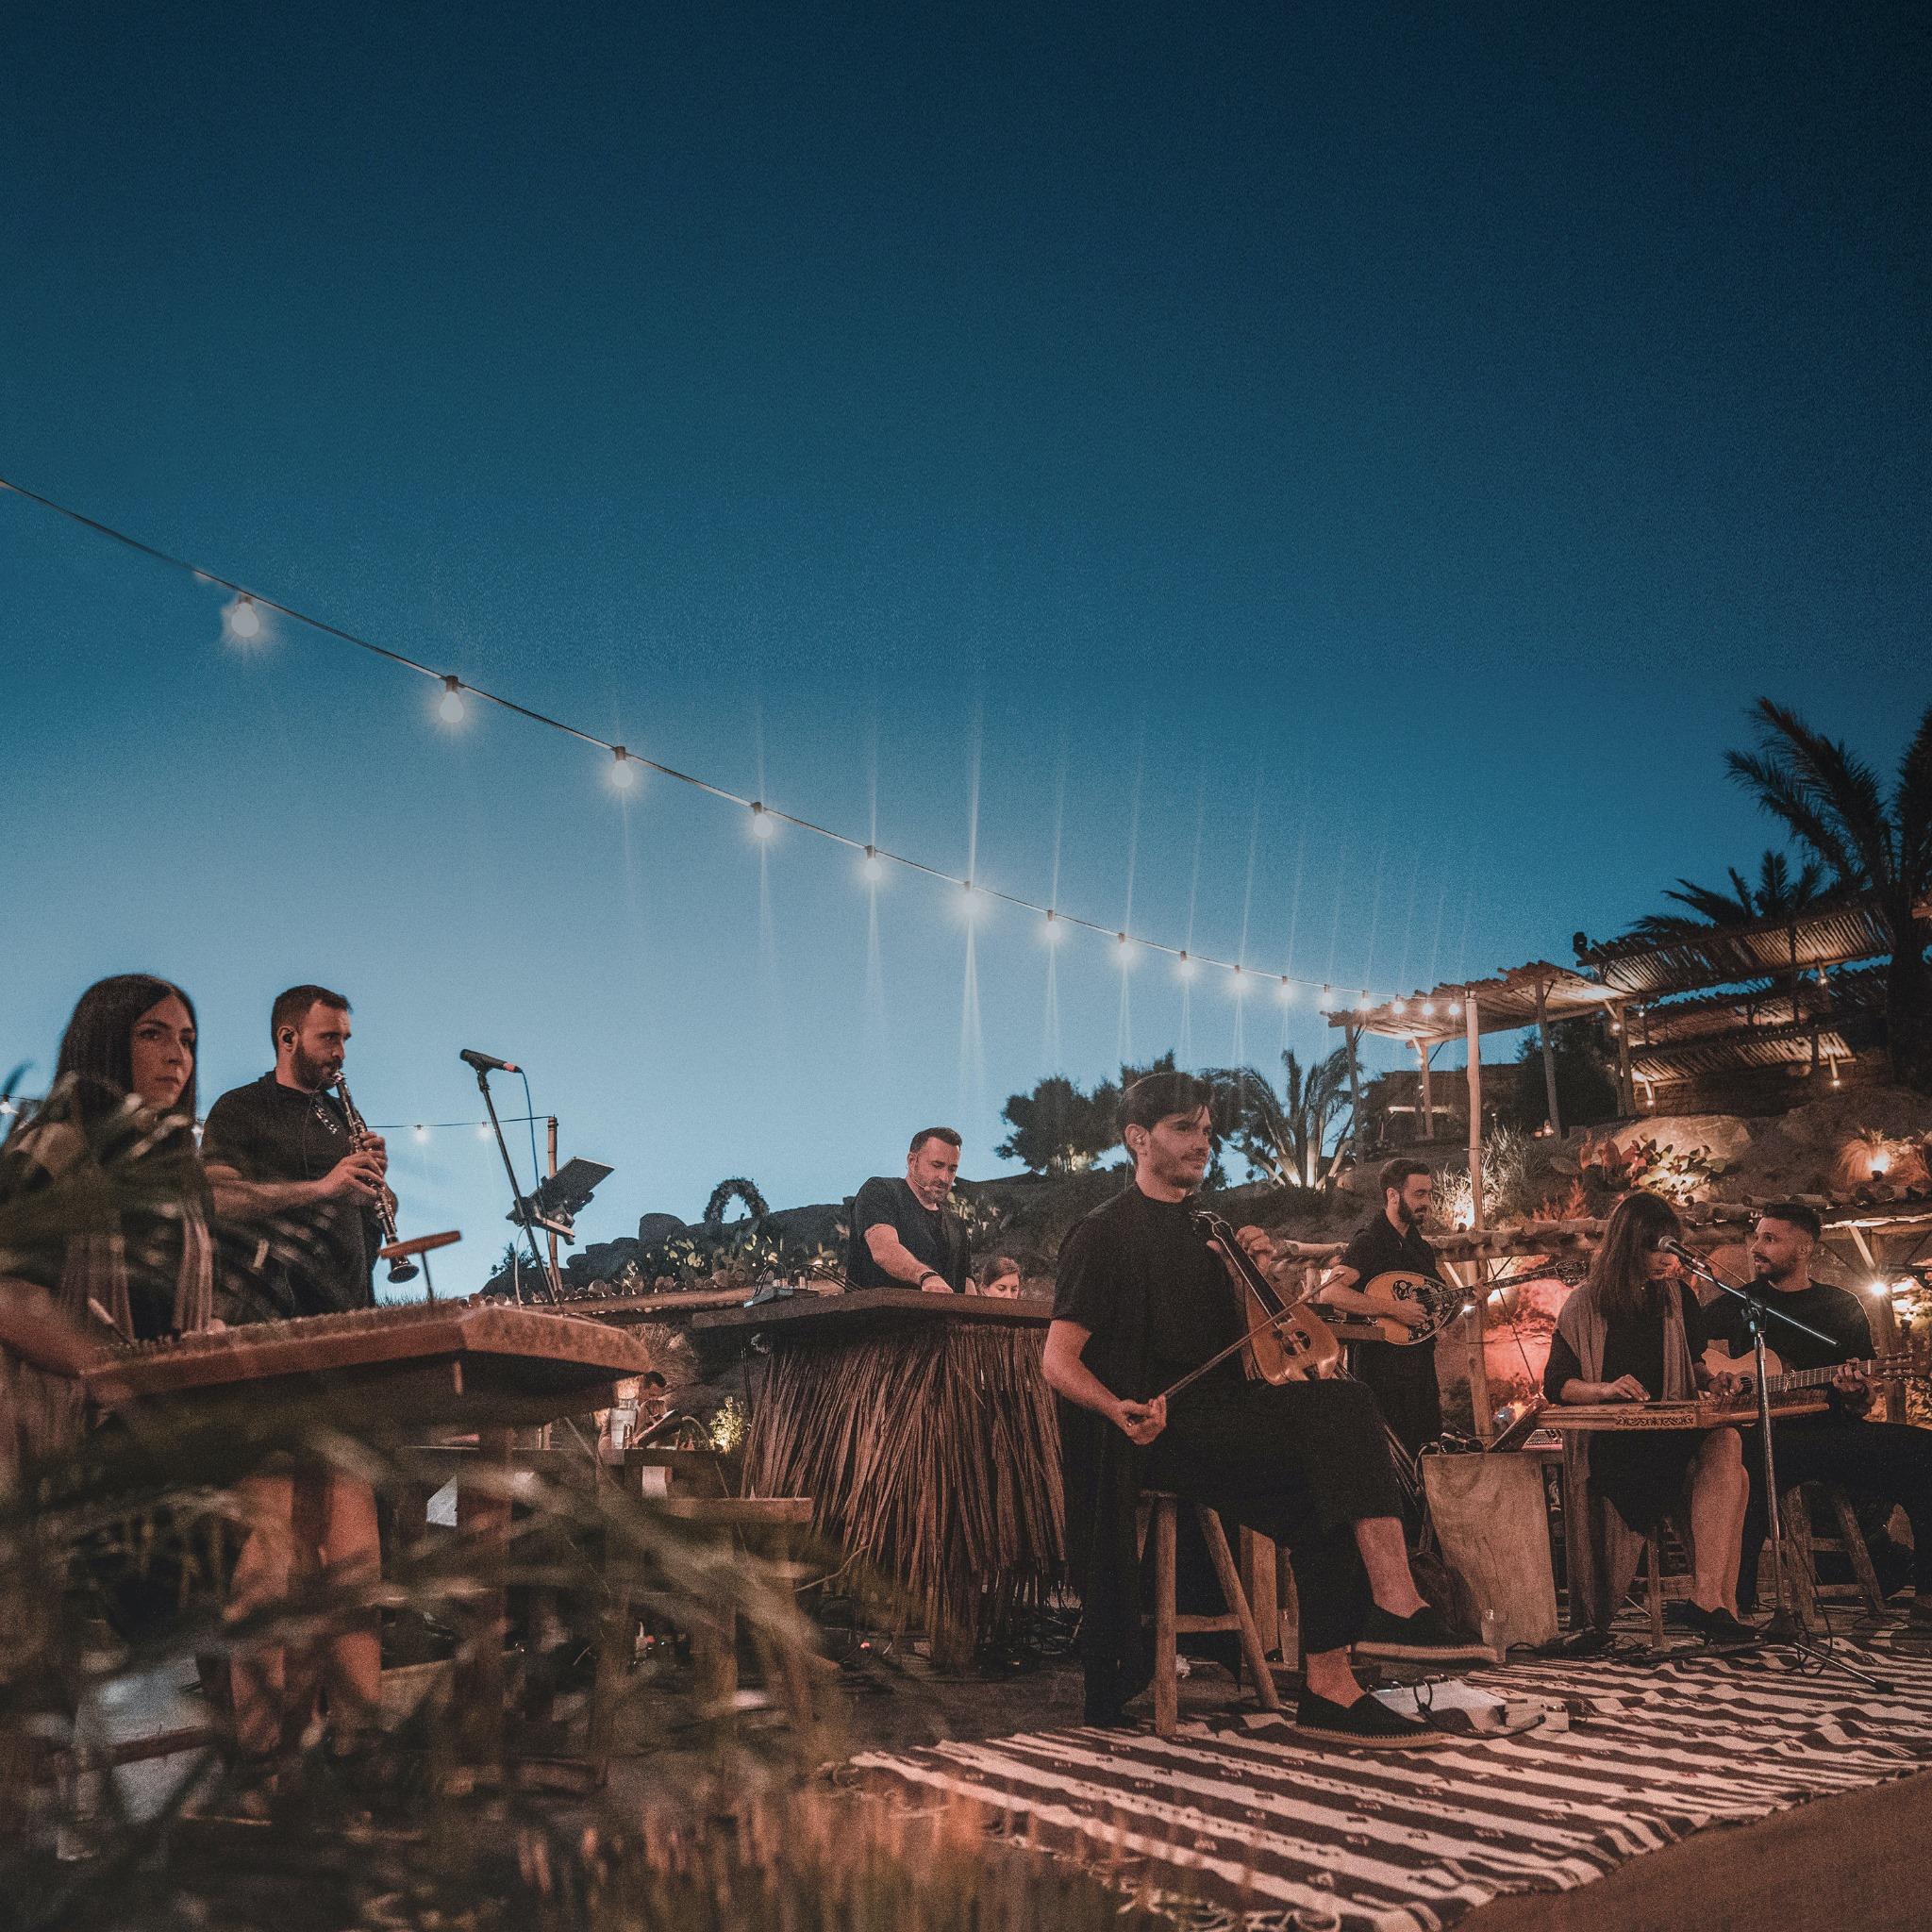 Valeron & the band in Mykonos